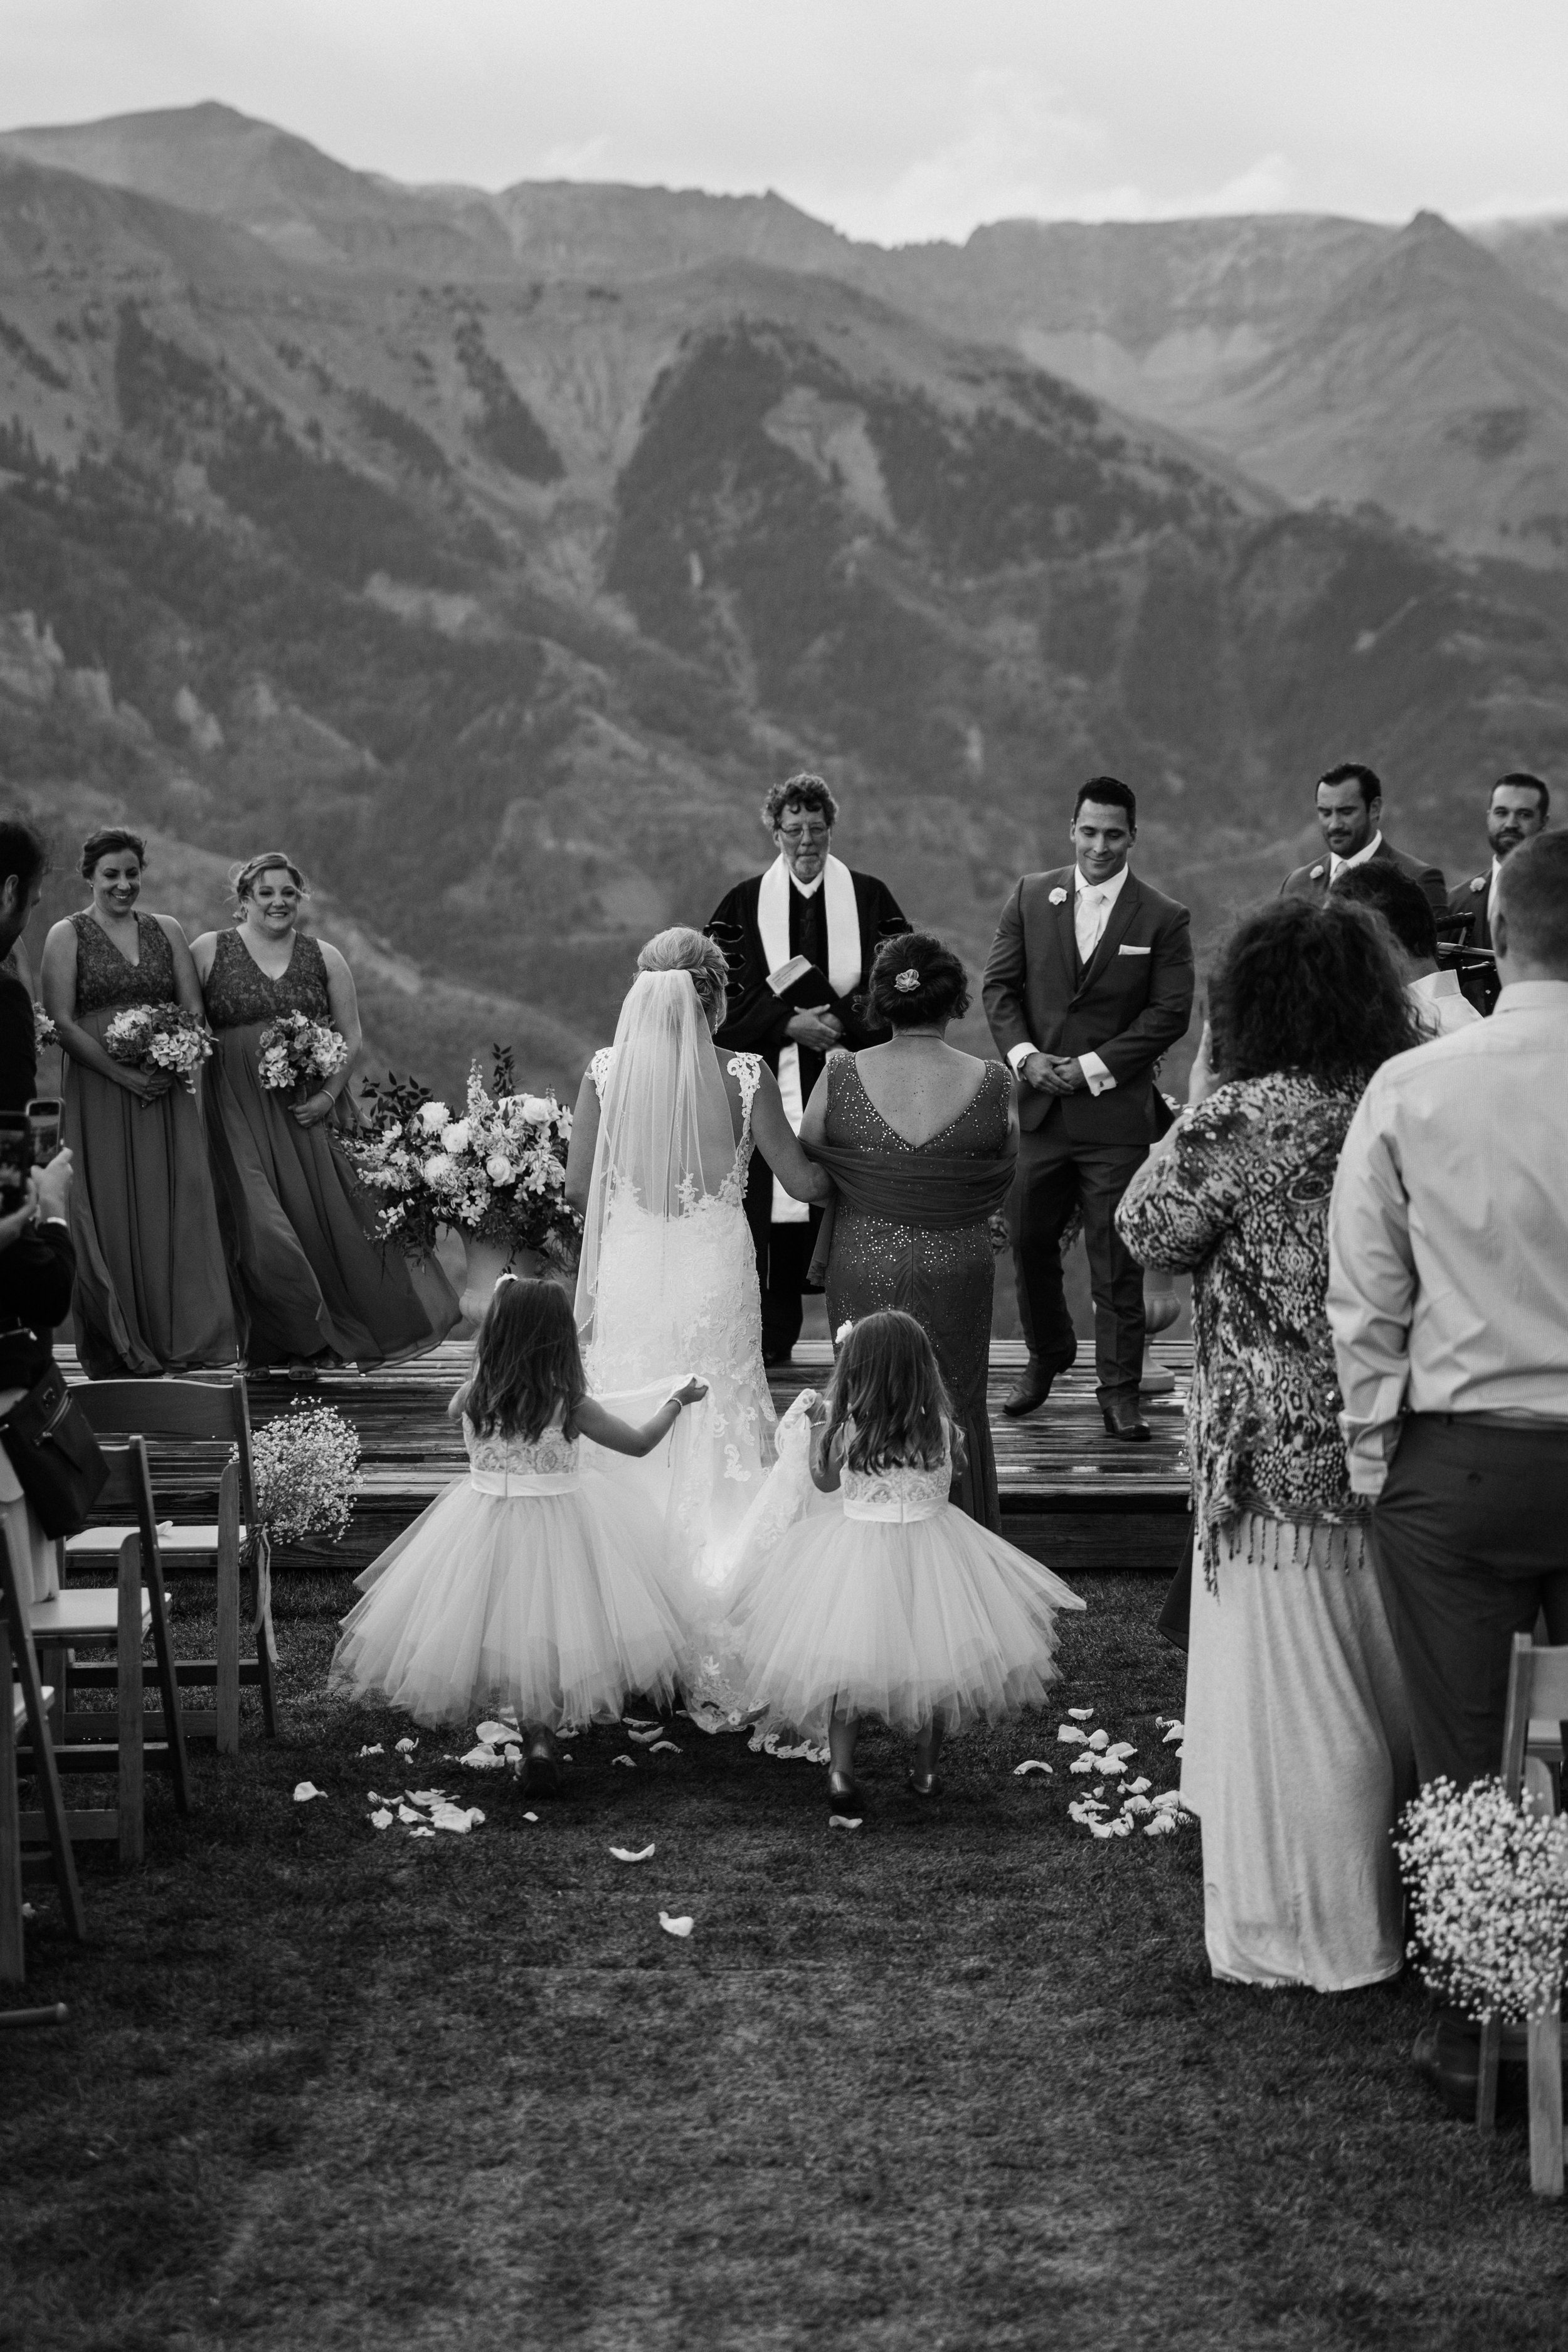 leahandashton-telluride-wedding-photography-0051.jpg